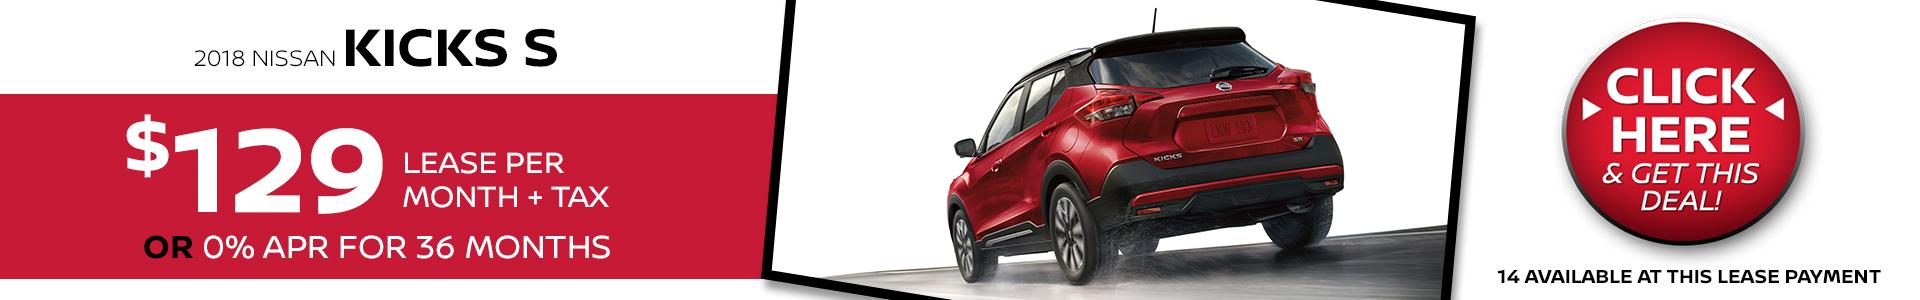 Mossy Nissan - Kicks $129 Lease